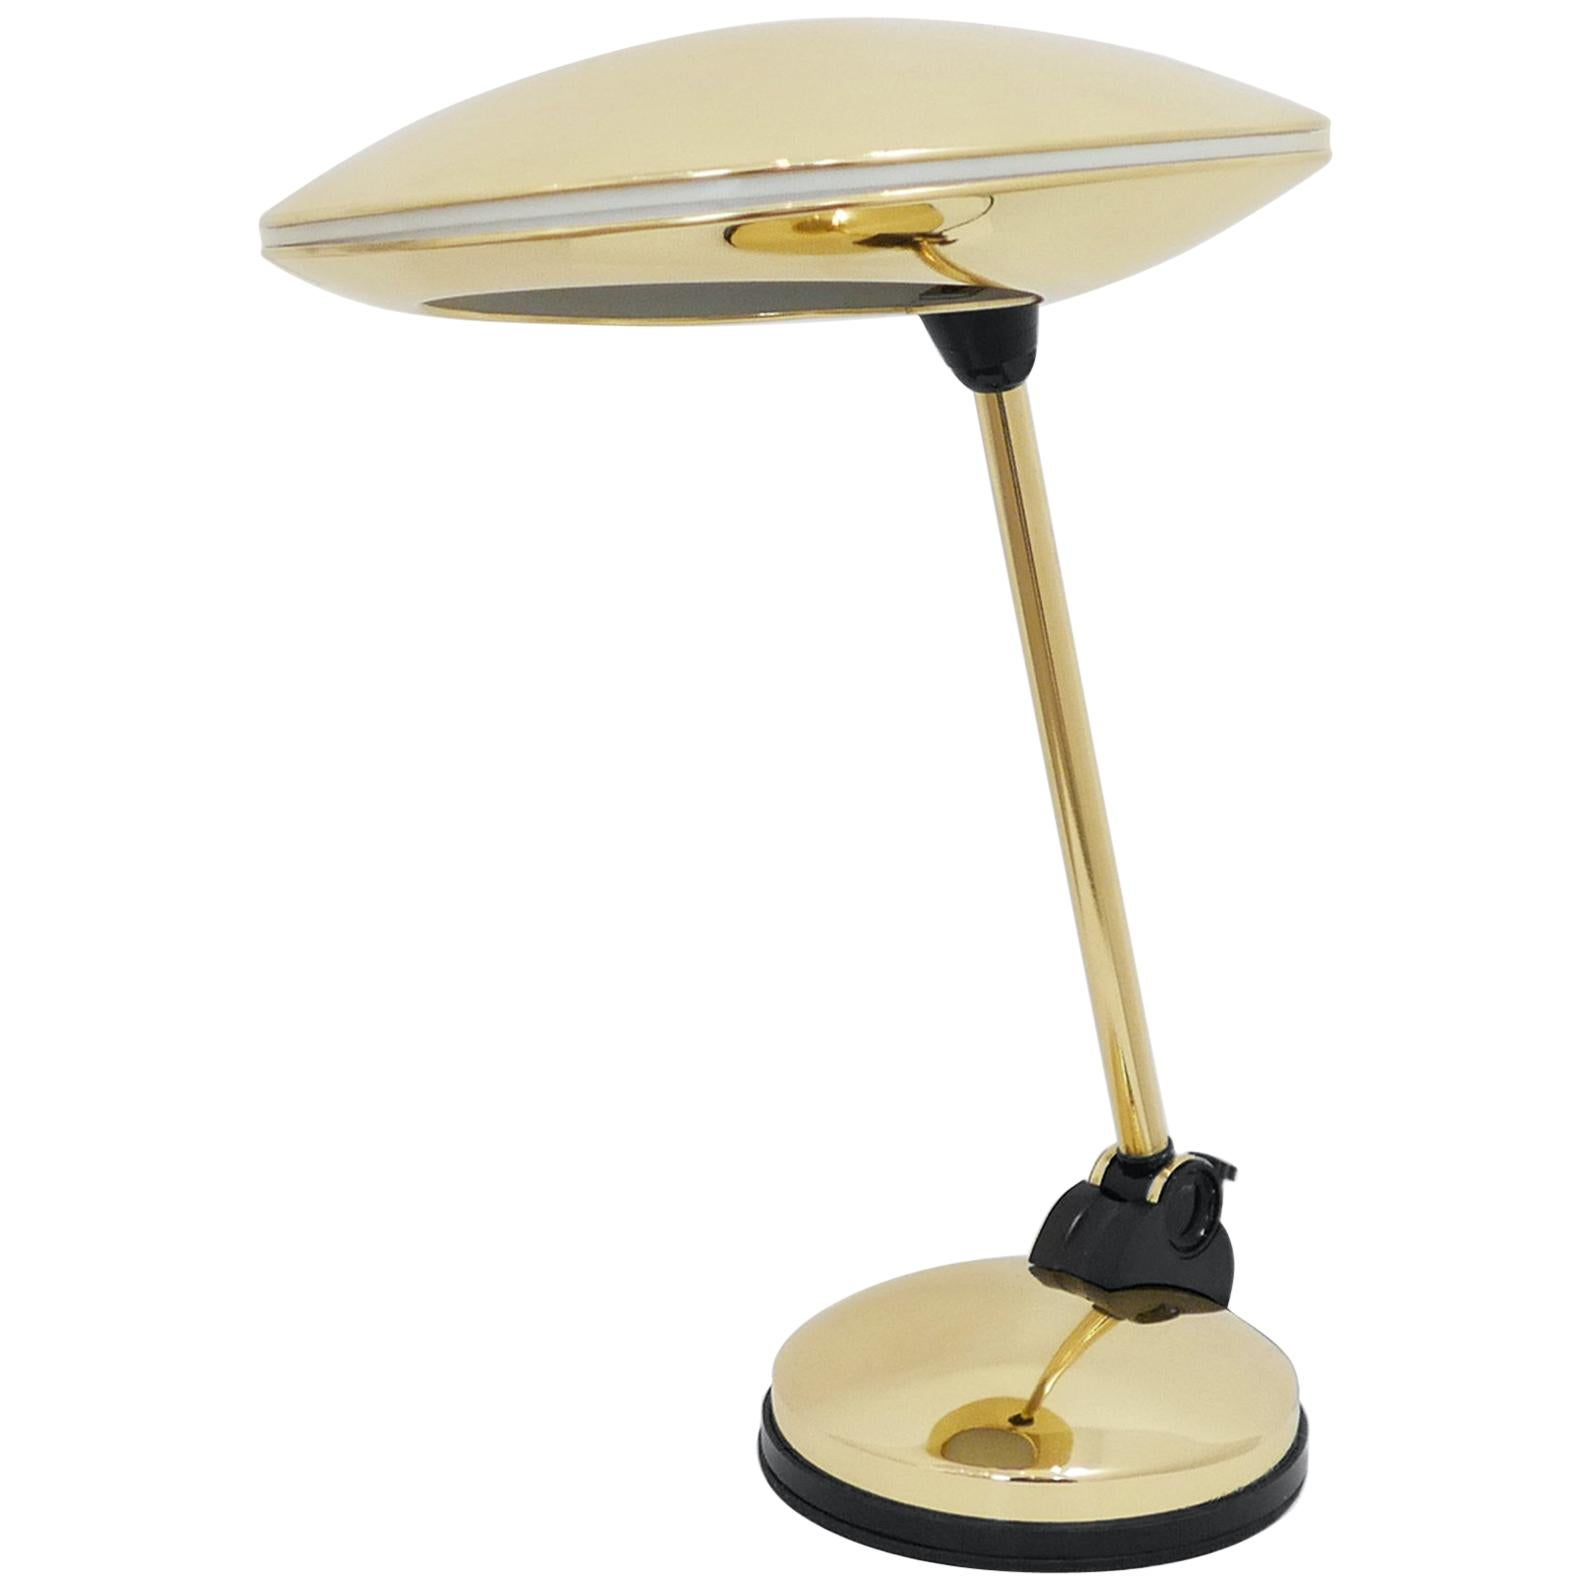 Oscar Torlasco Midcentury Desk Lamp, circa 1950s